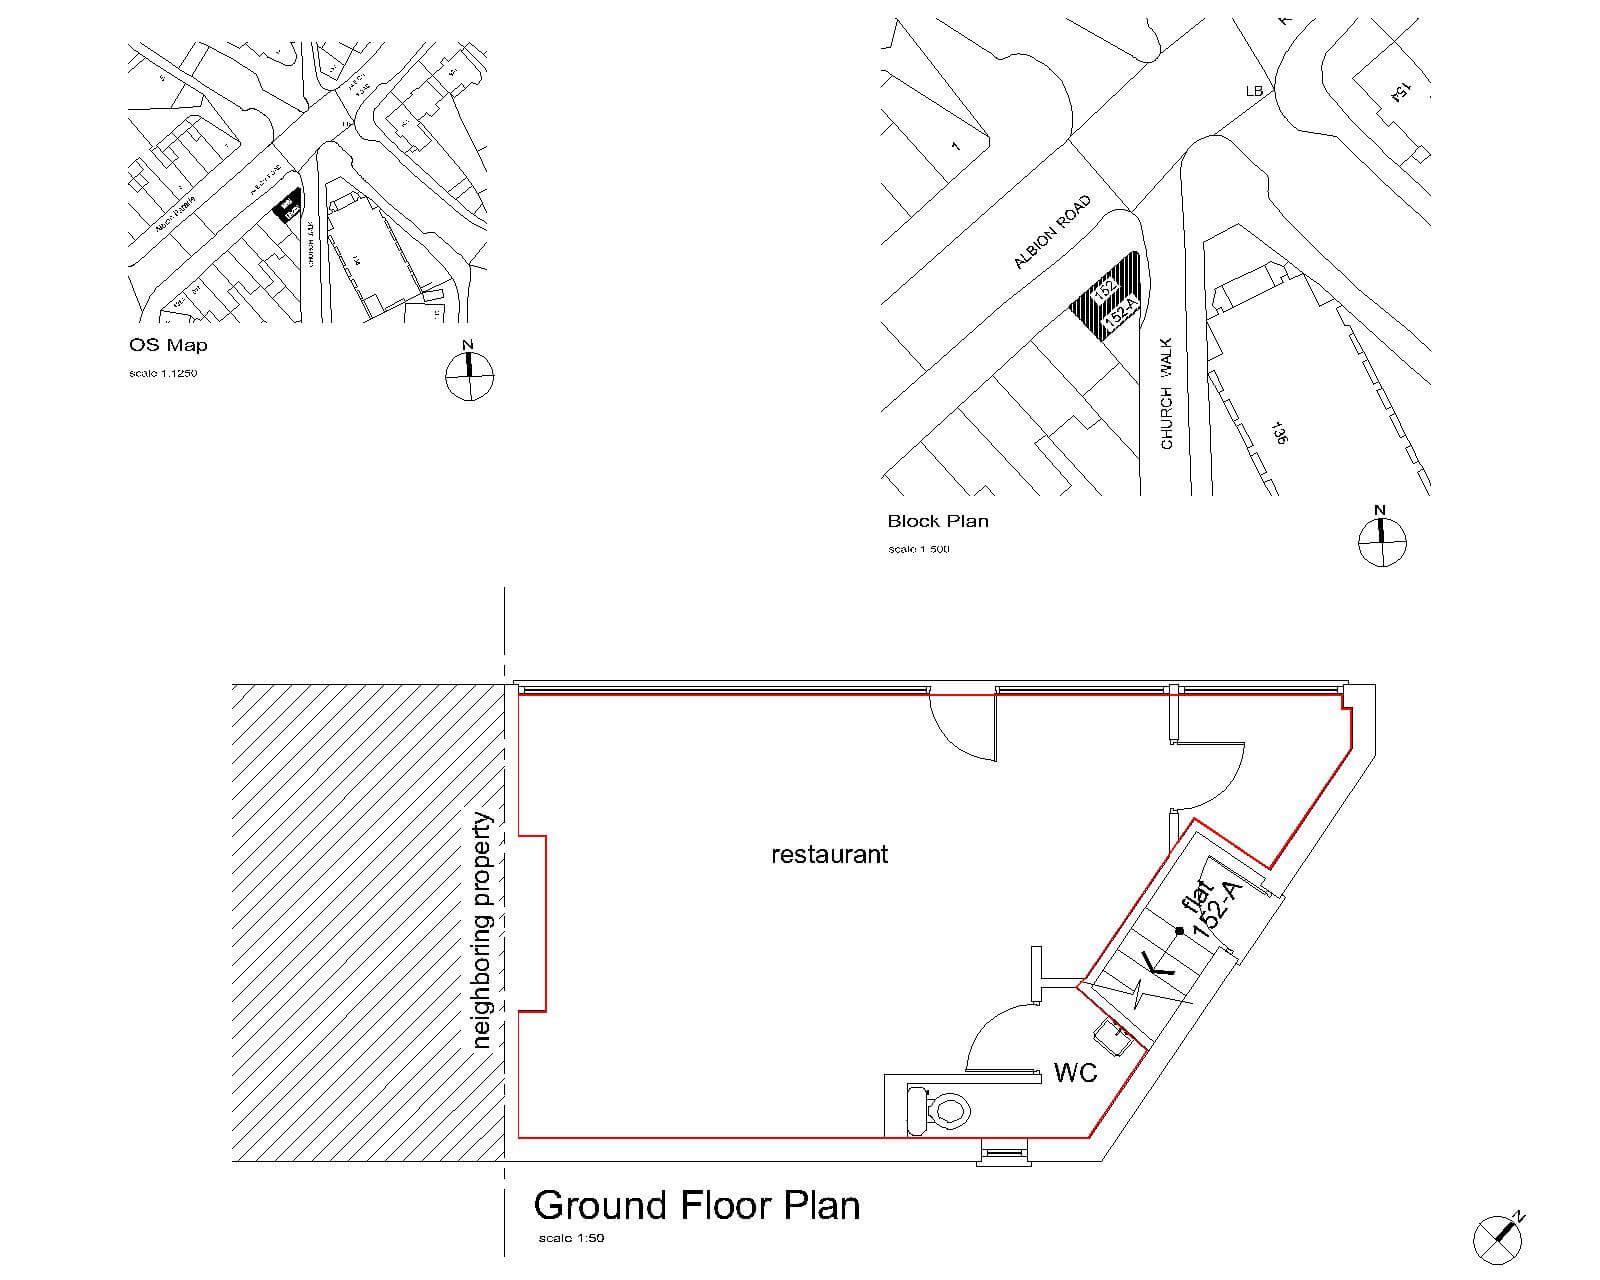 lease-plan-152-albion-road-n16-9pa